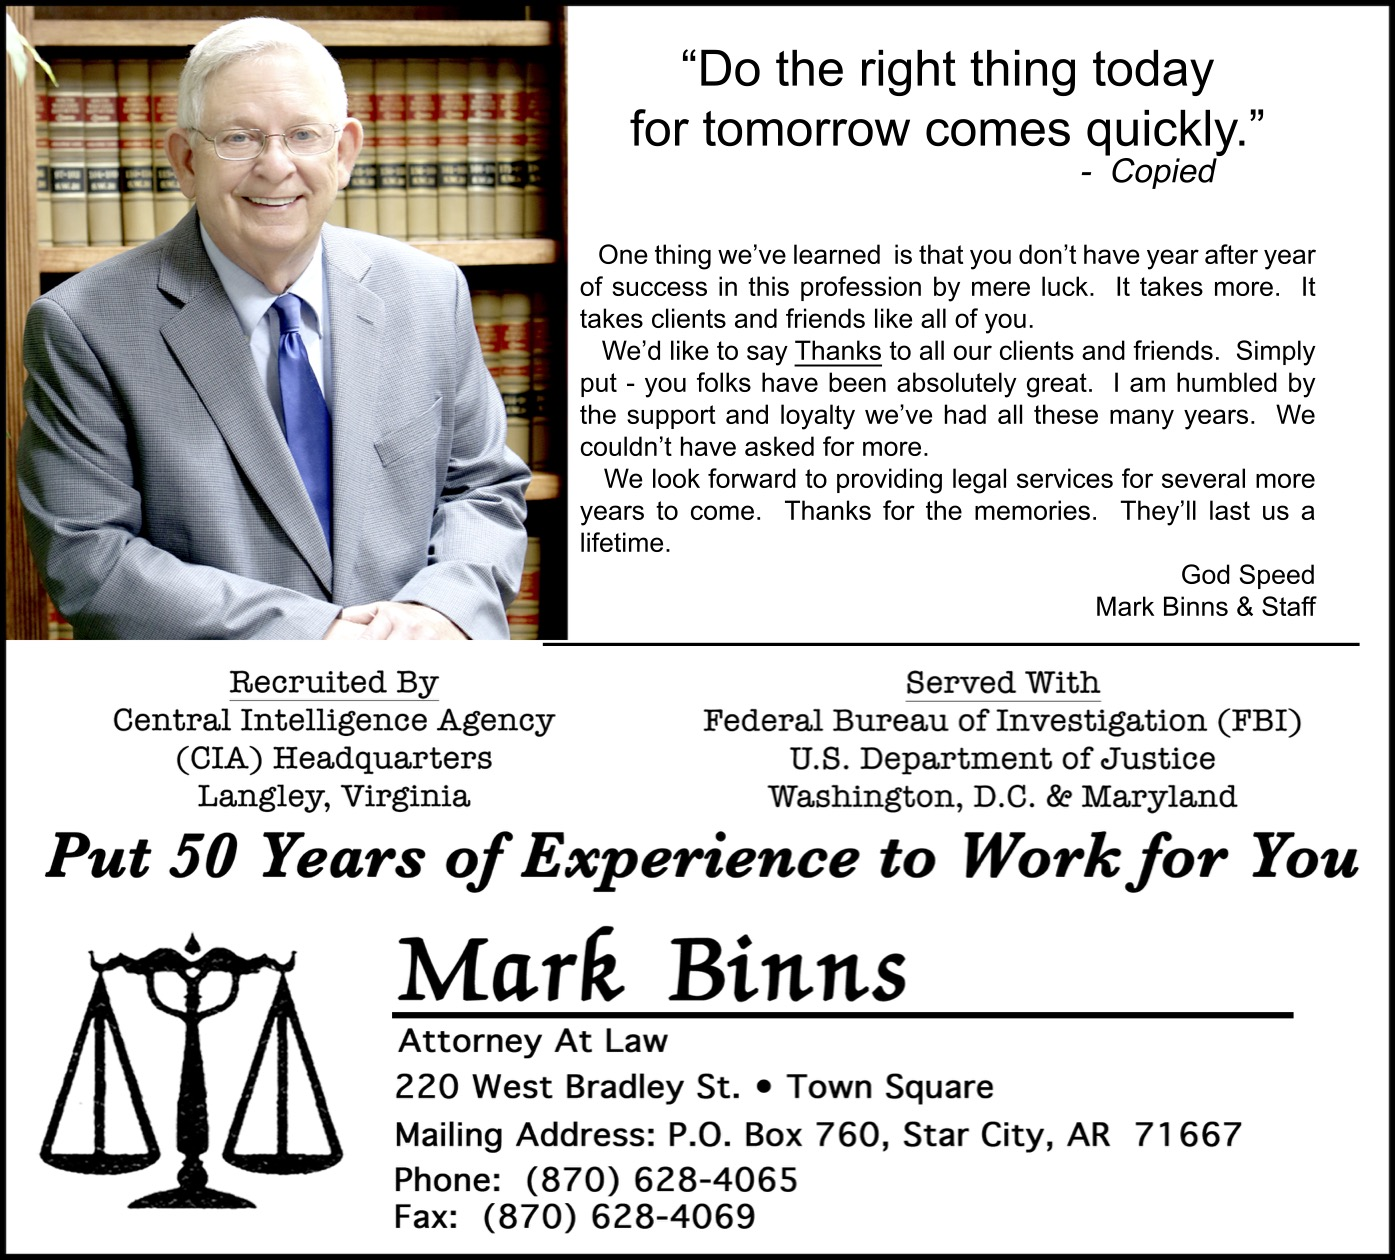 Mark Binns-Attorney At Law